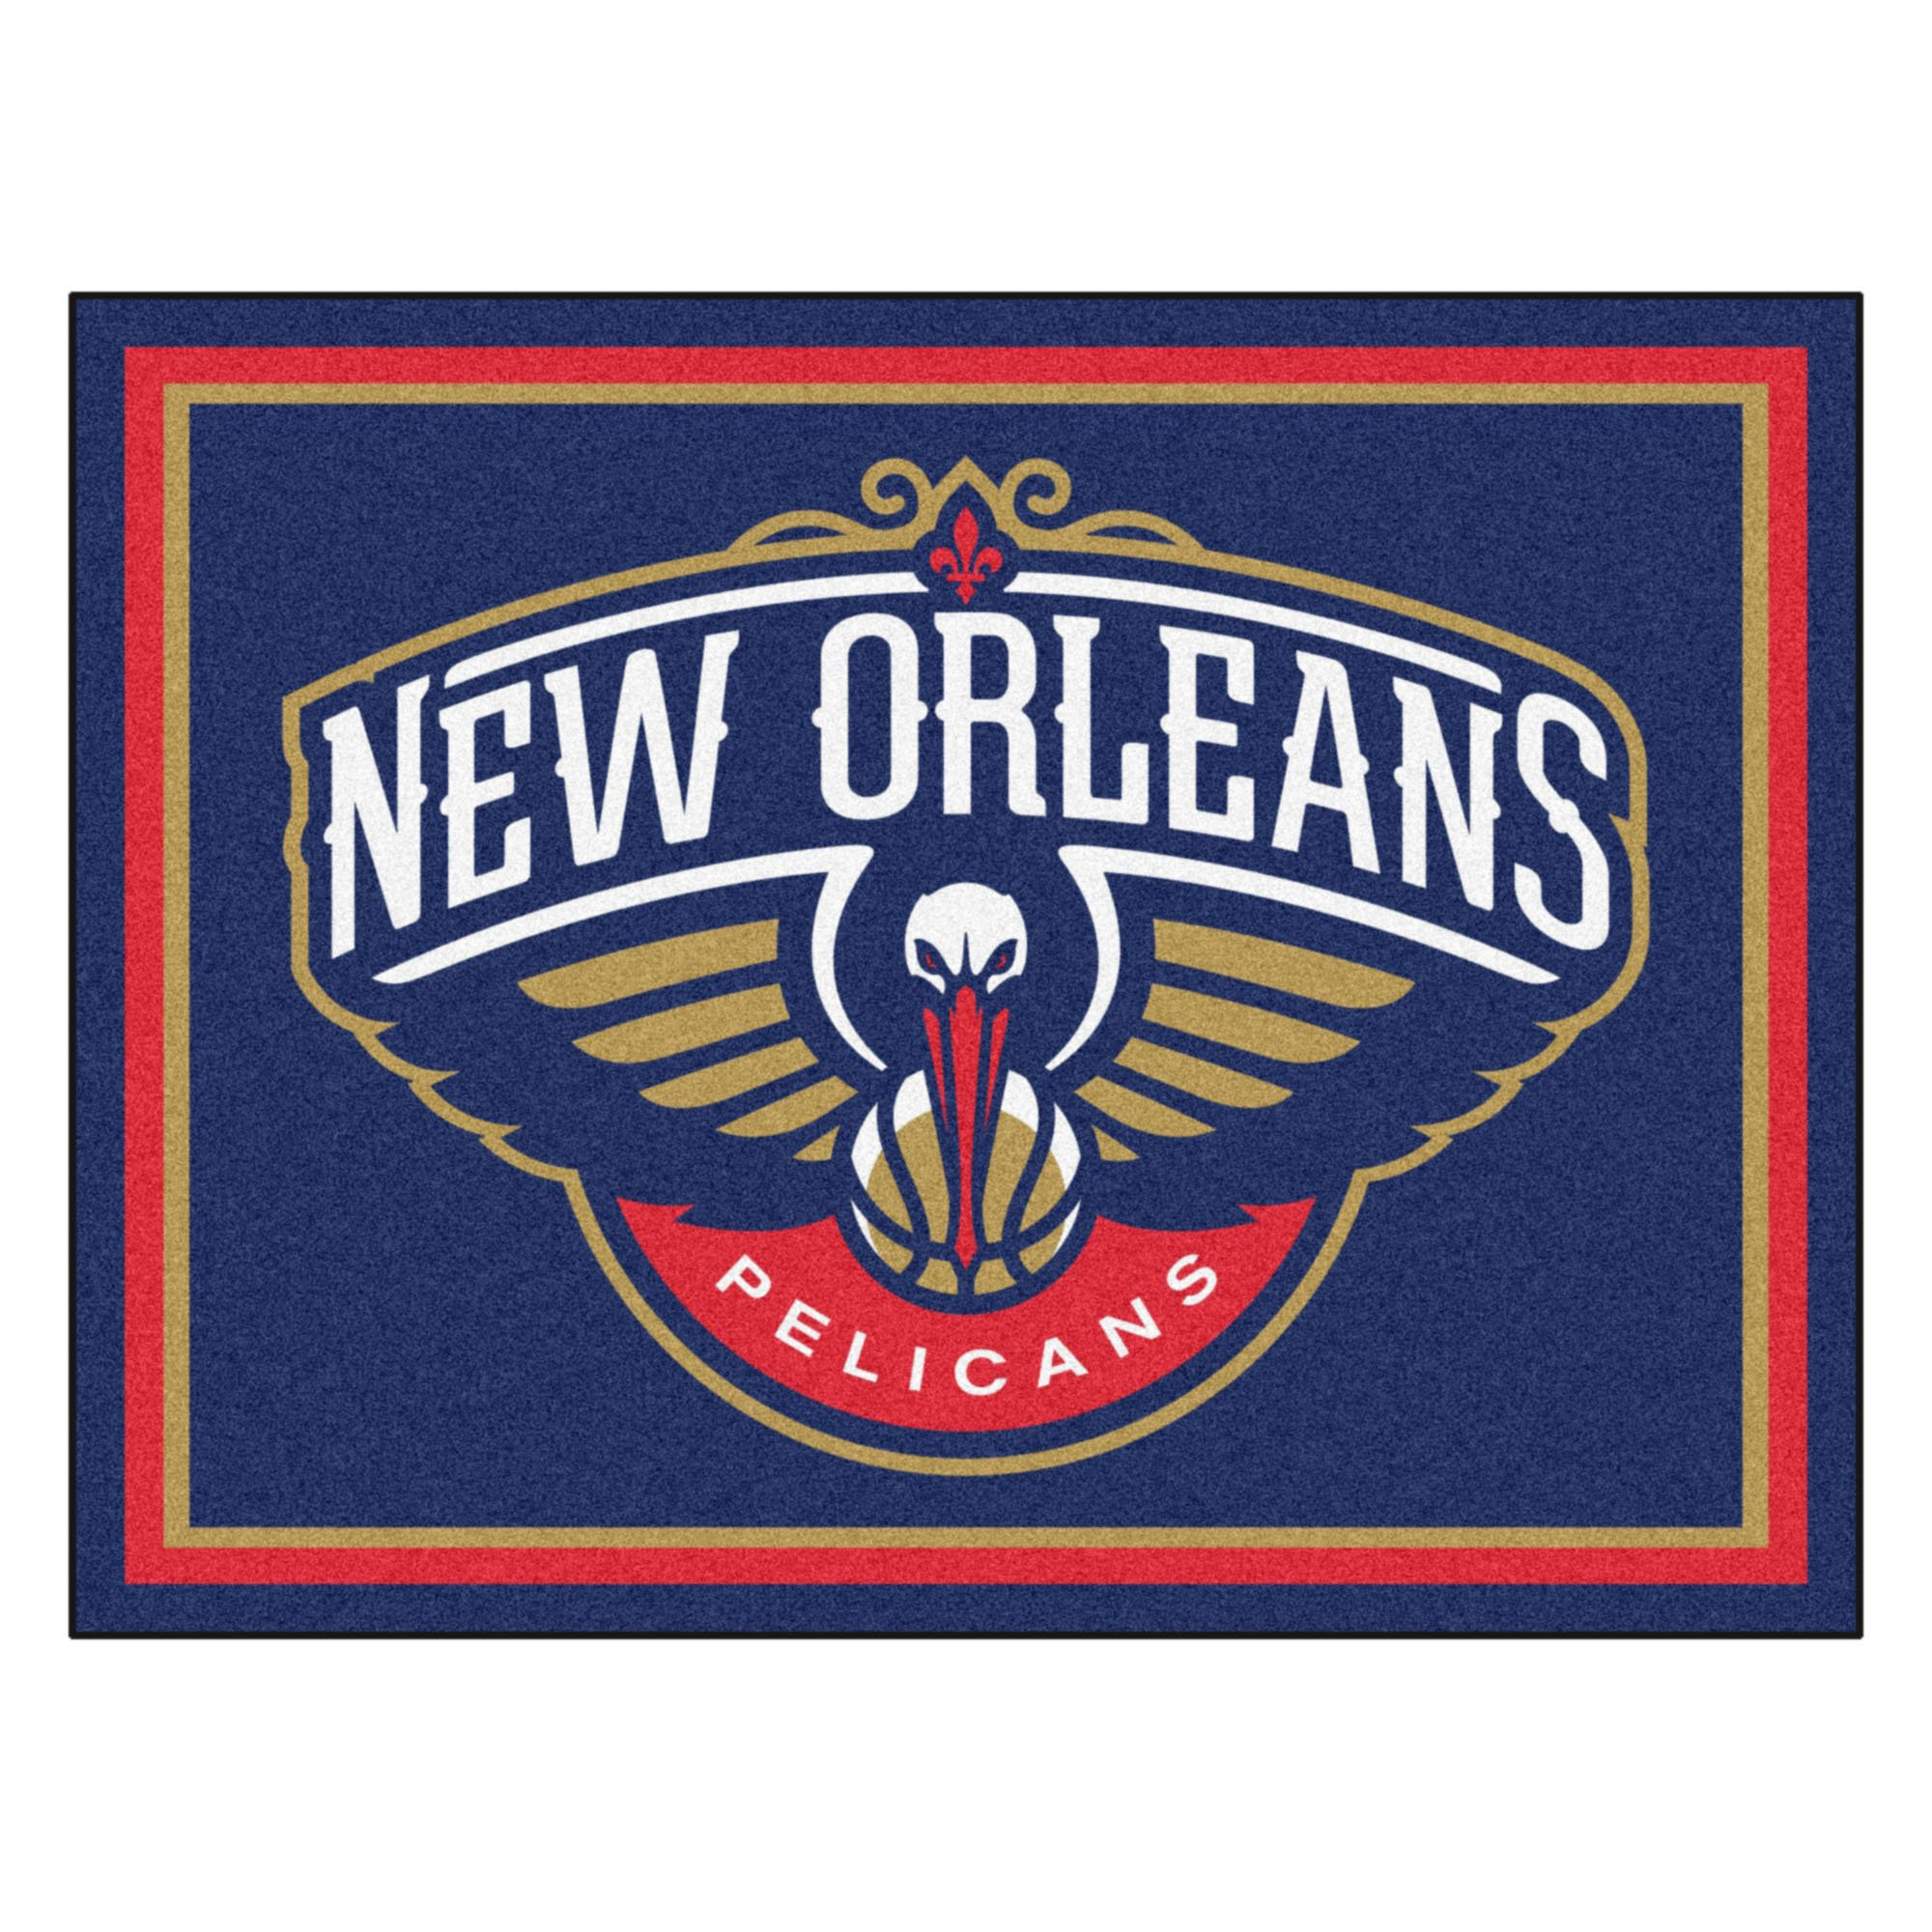 FANMATS 17460 NBA New Orleans Pelicans Rug